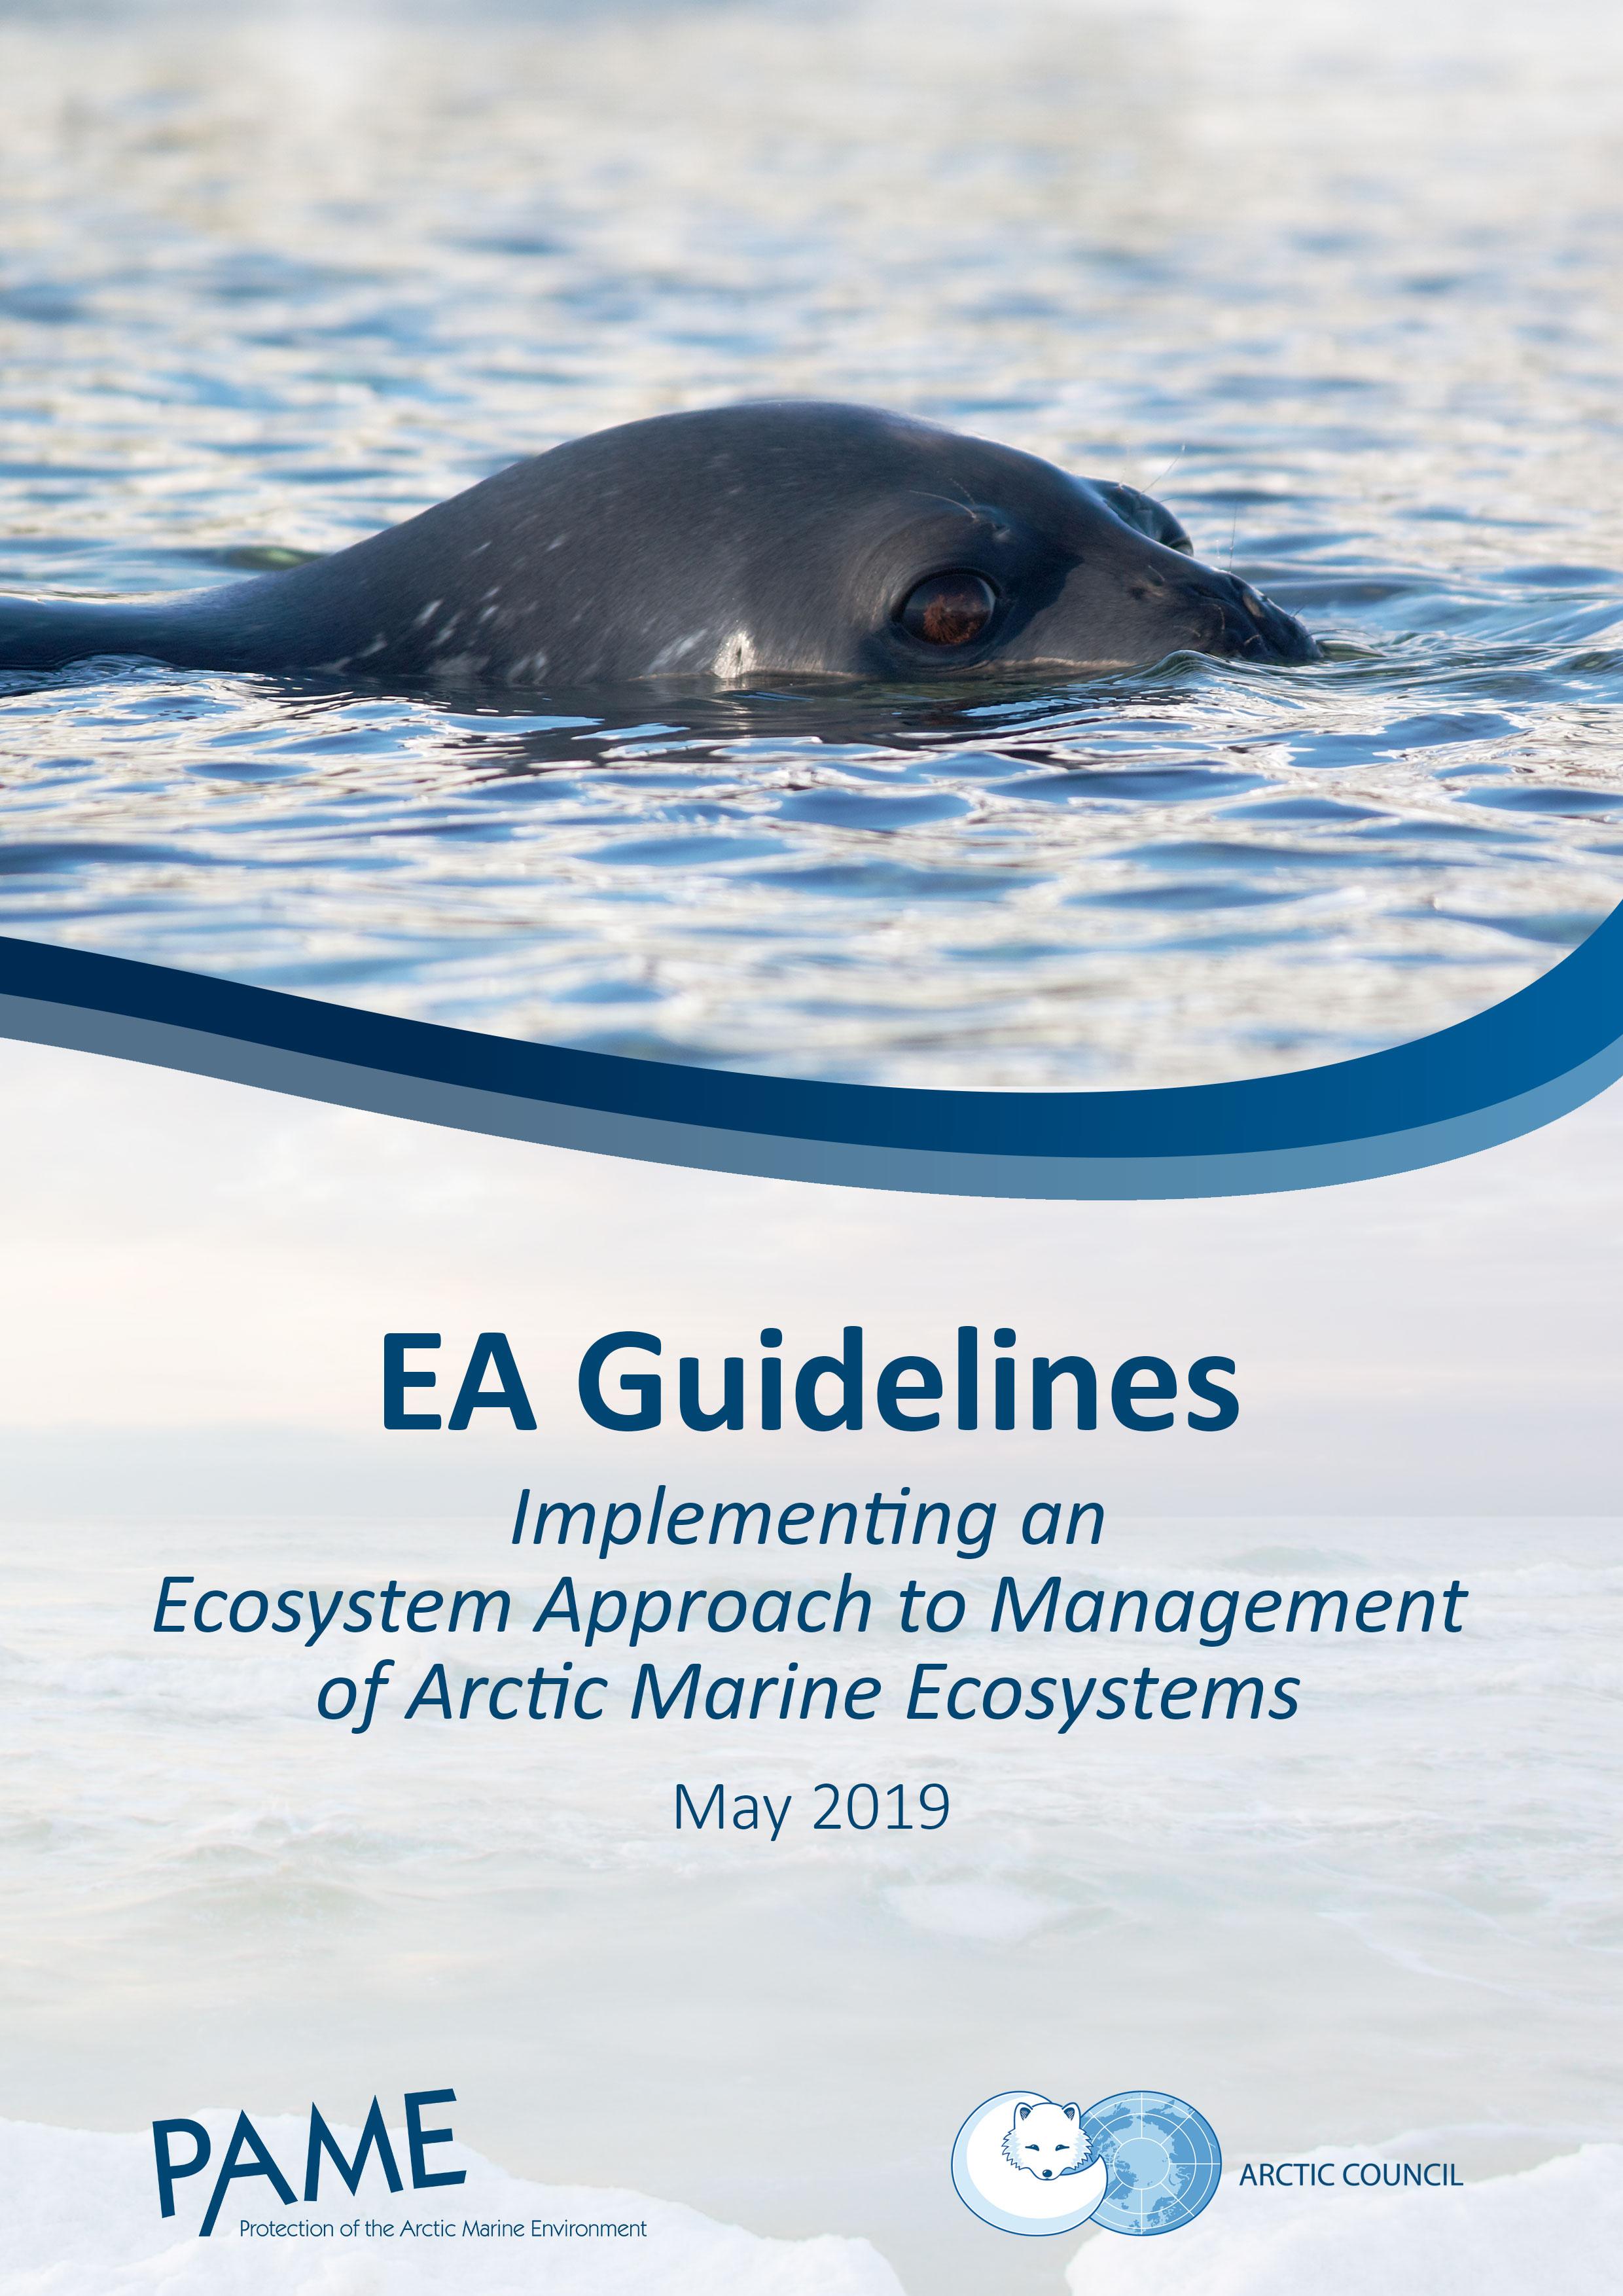 EA Guidelines